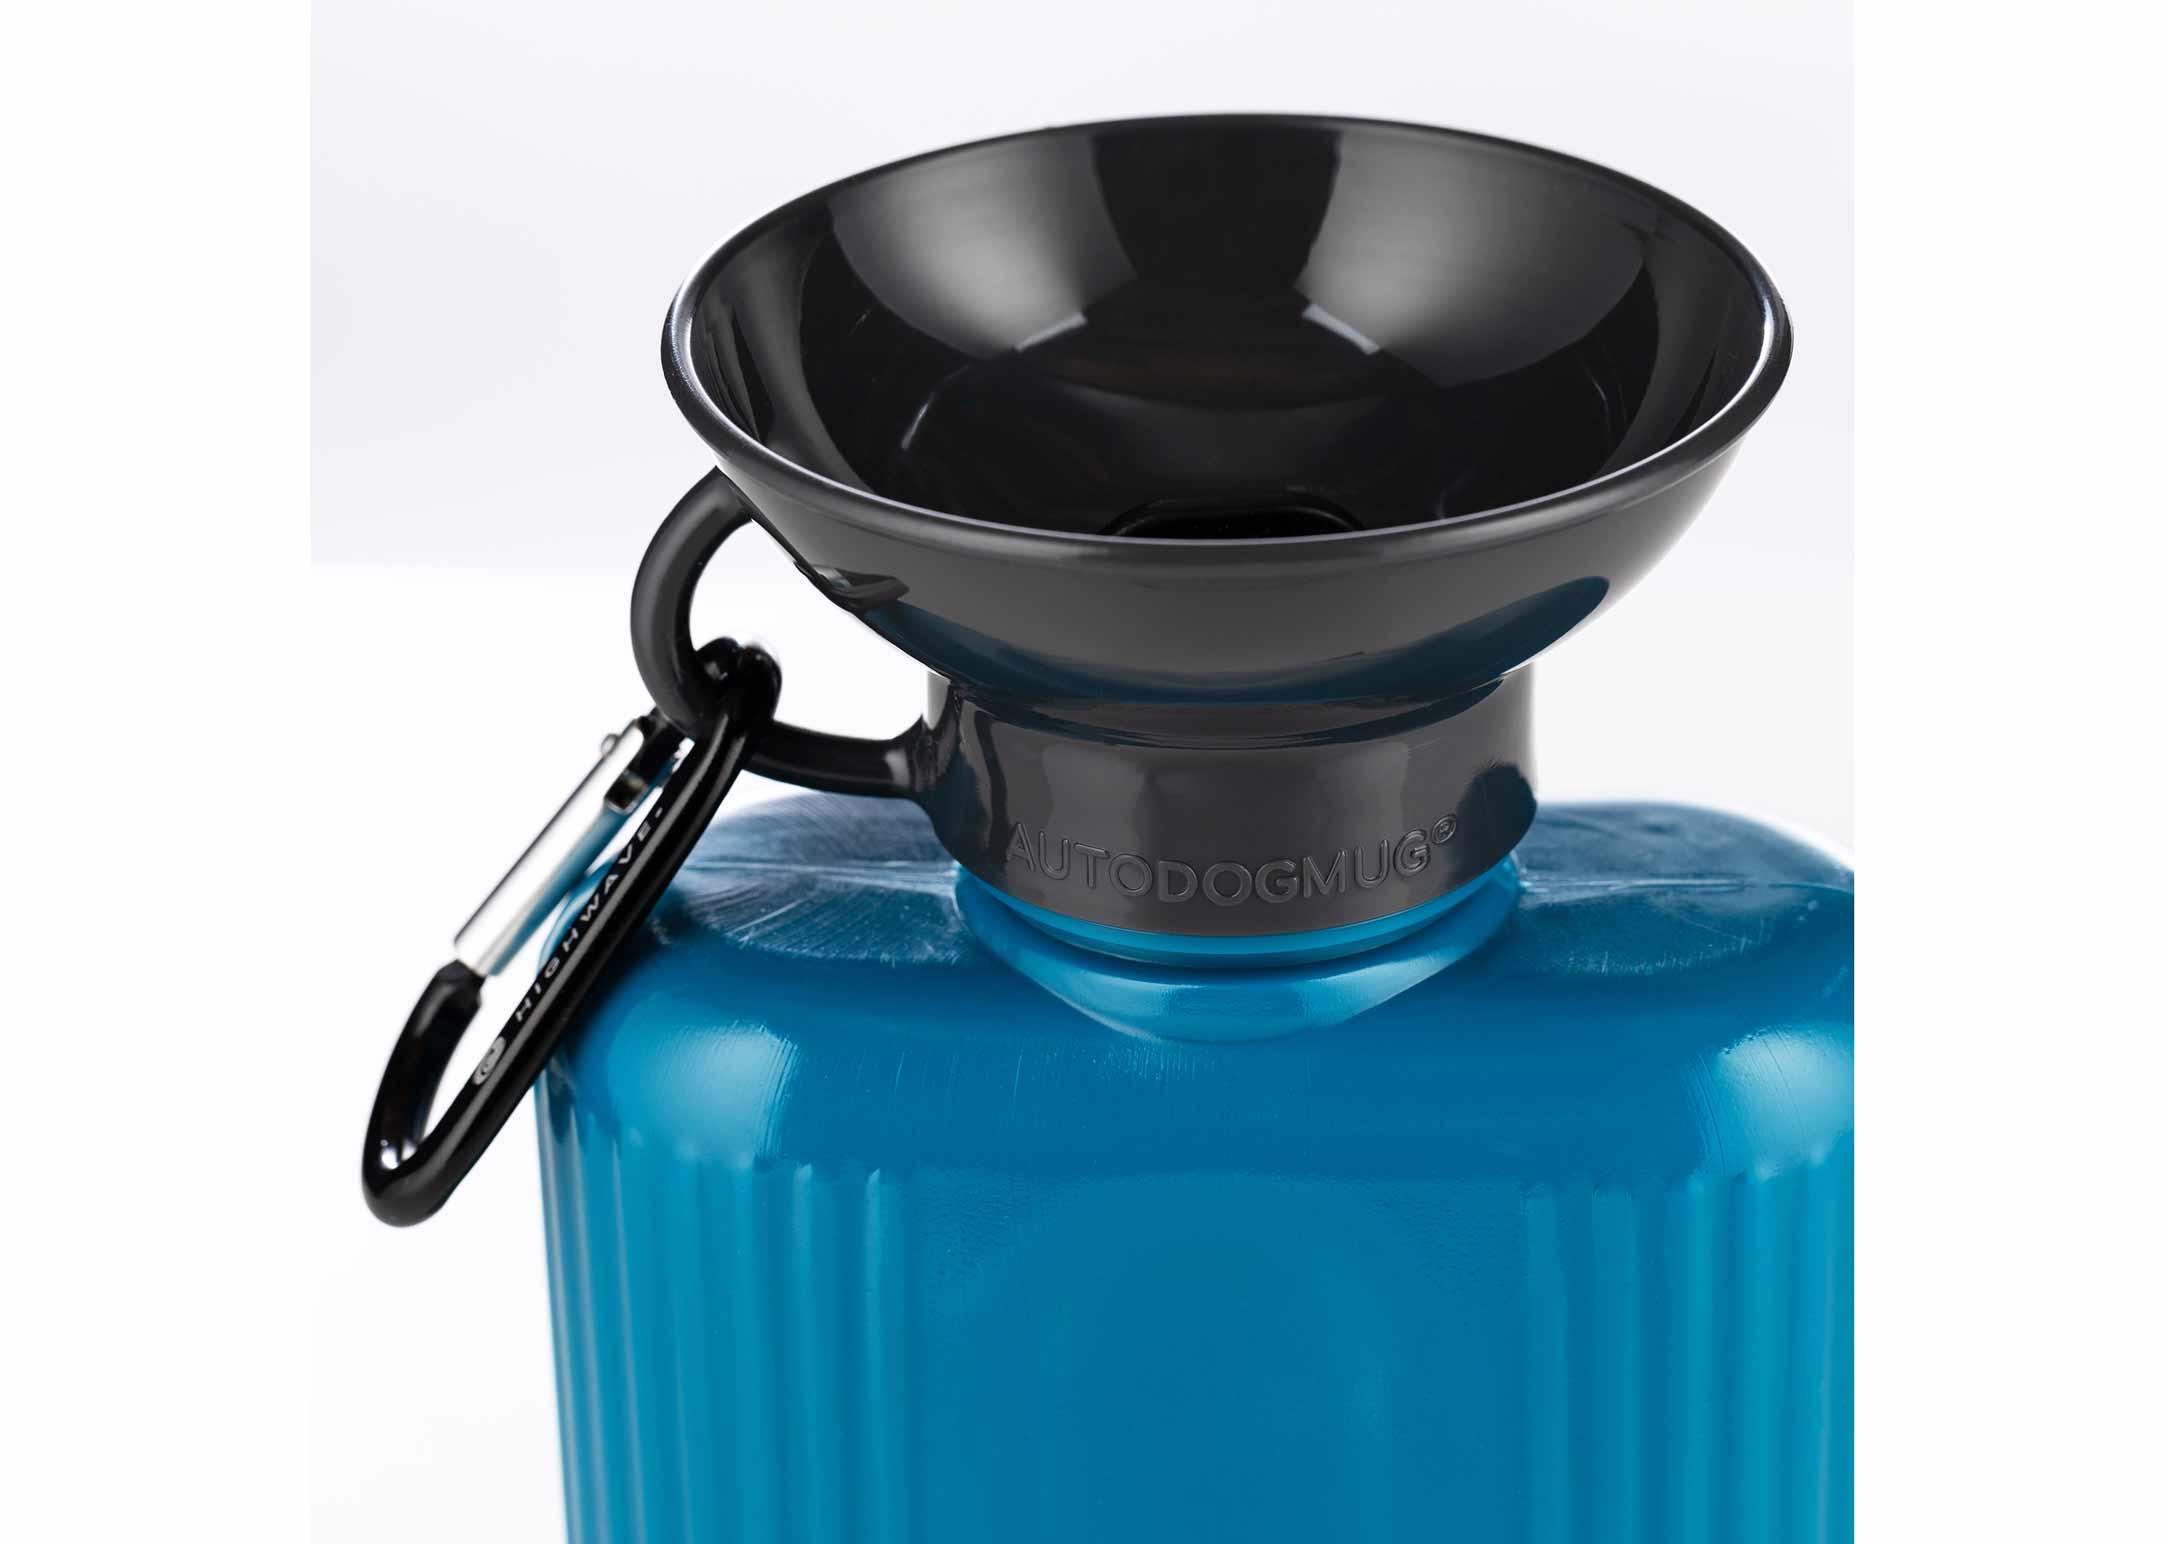 Highwave Auto Dog Mug Growler Pacific Blue 1300ml Drinking Bottle